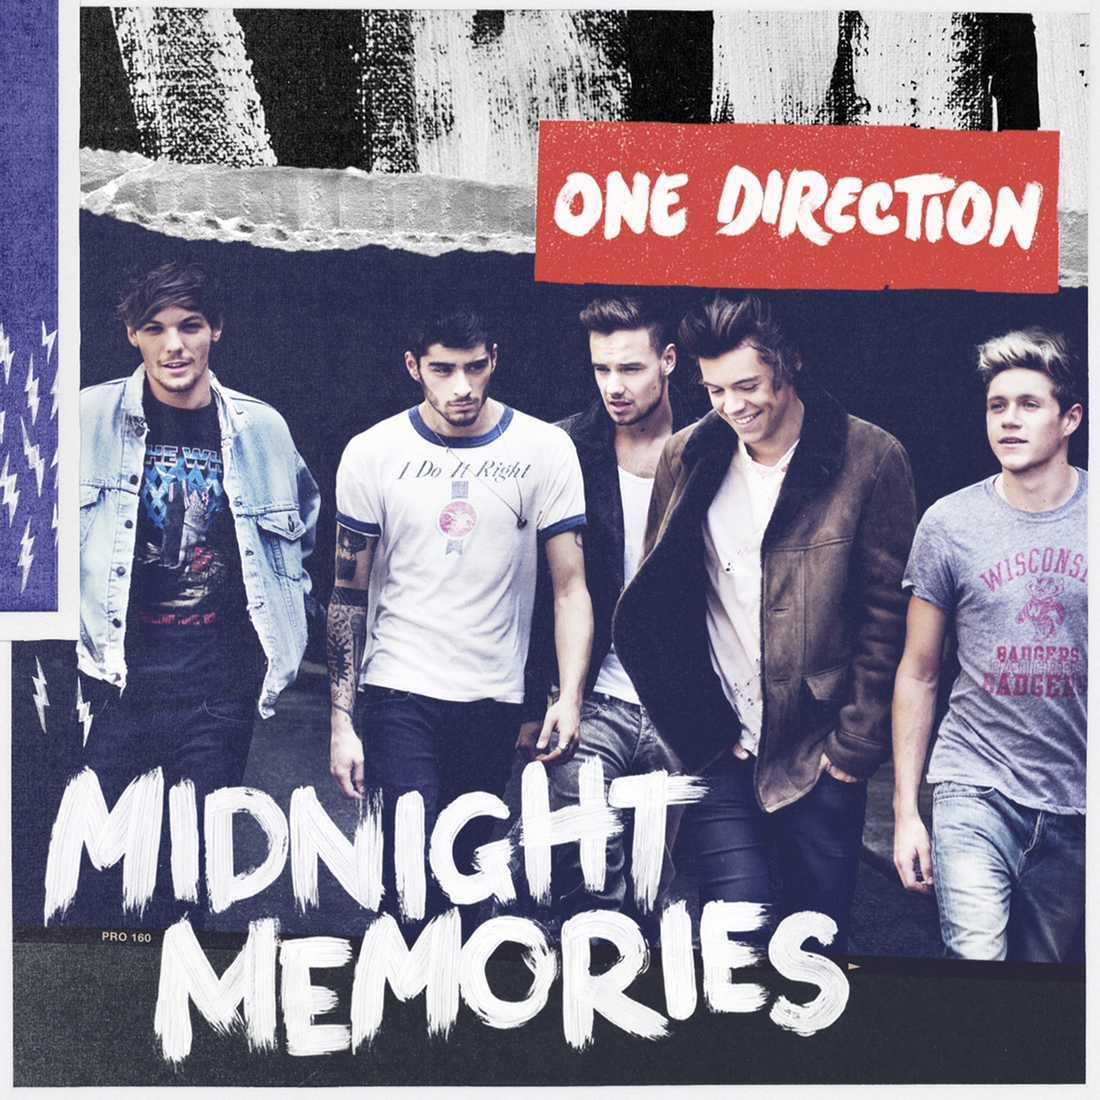 One Directions nya albumomslag.